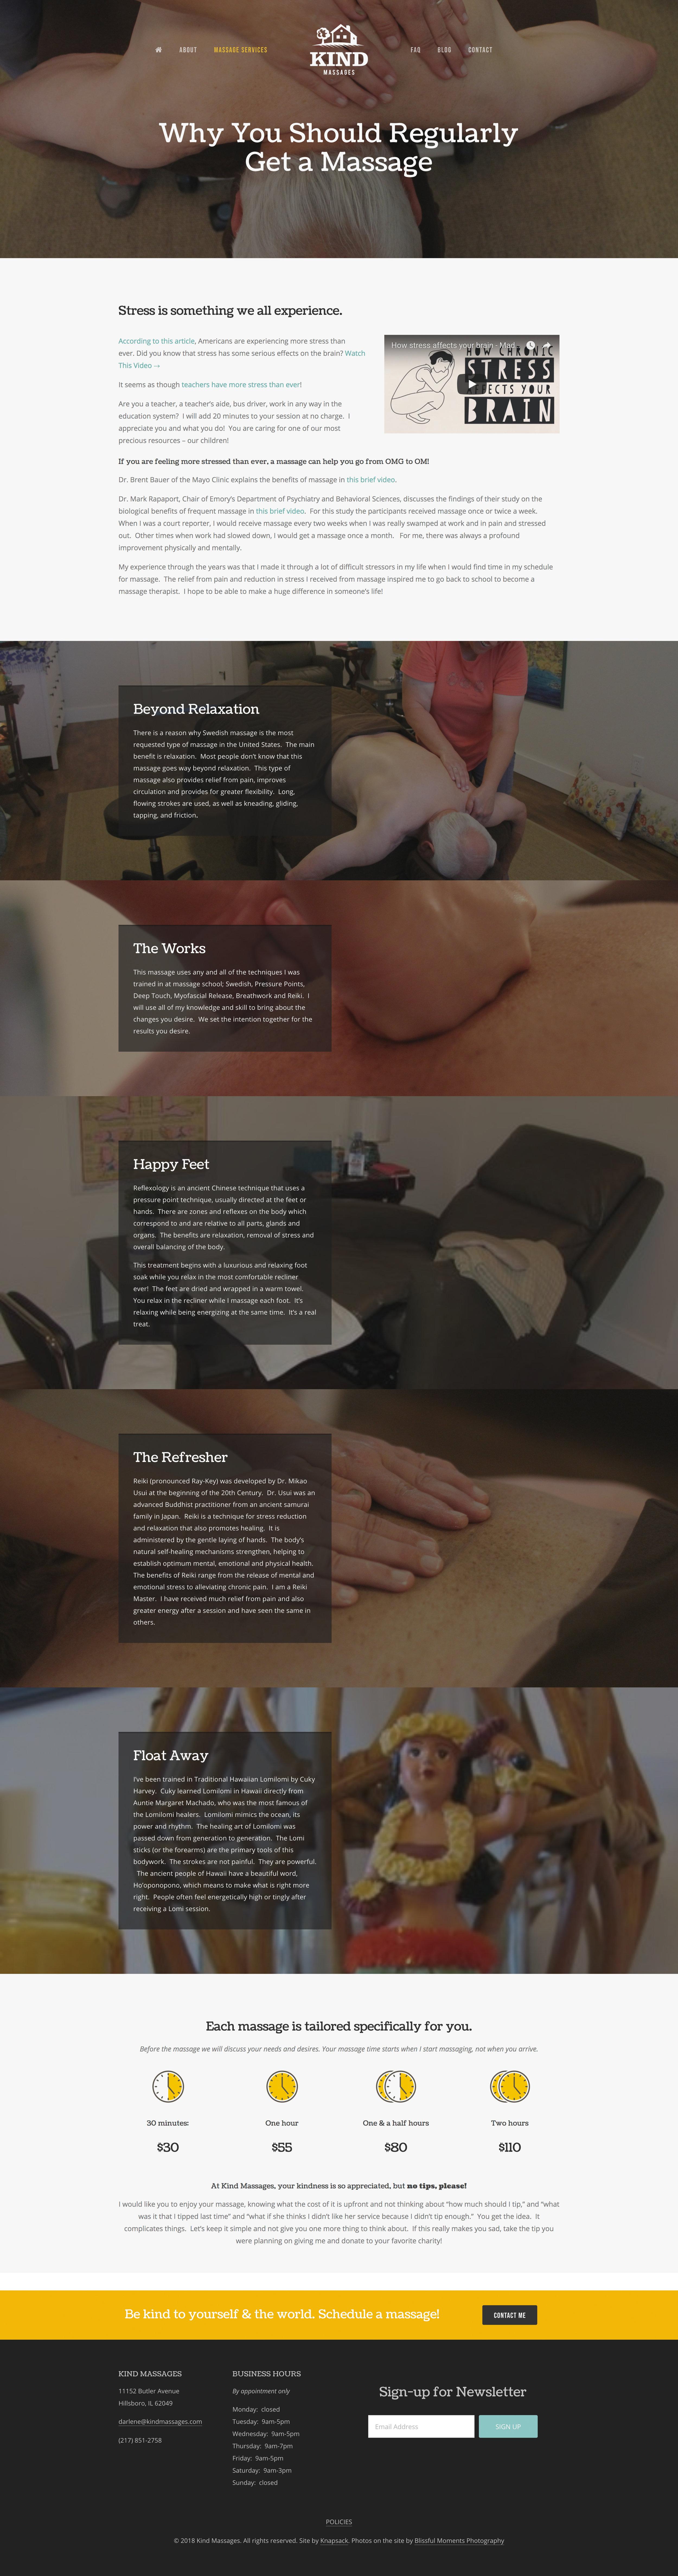 Kind-Massages-Services-Air.jpg